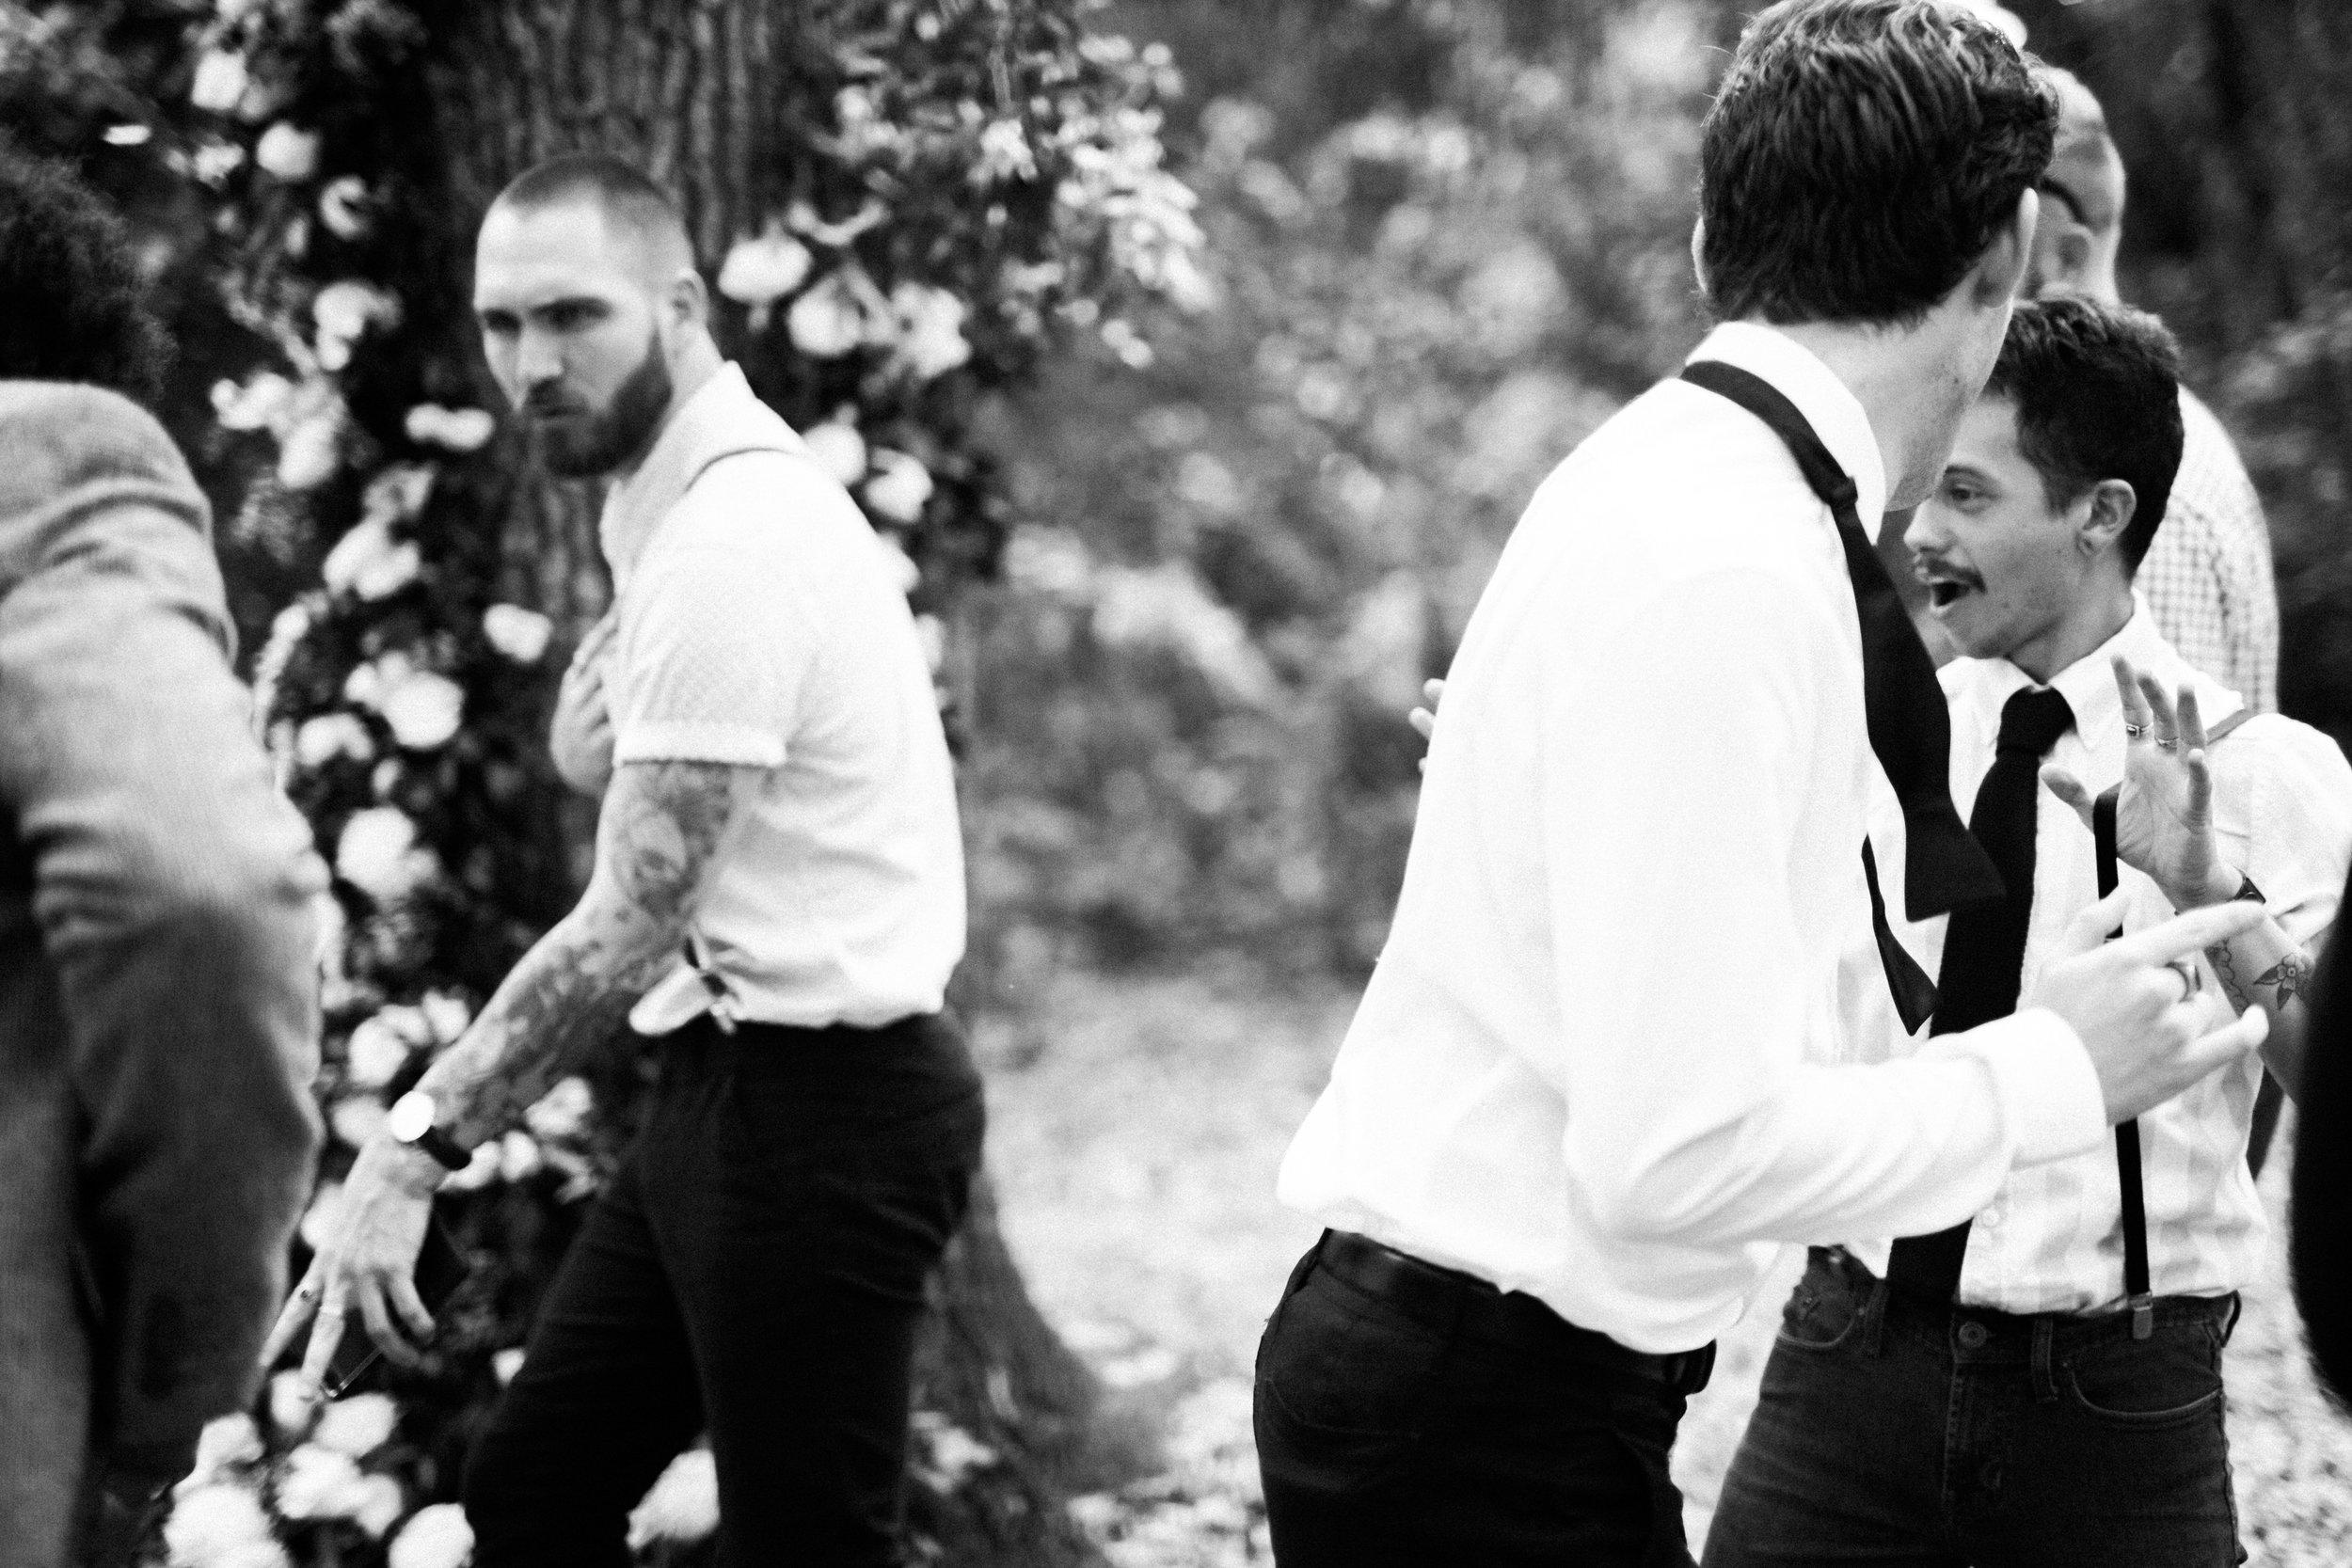 Festive Lighthearted Wedding Ceremony